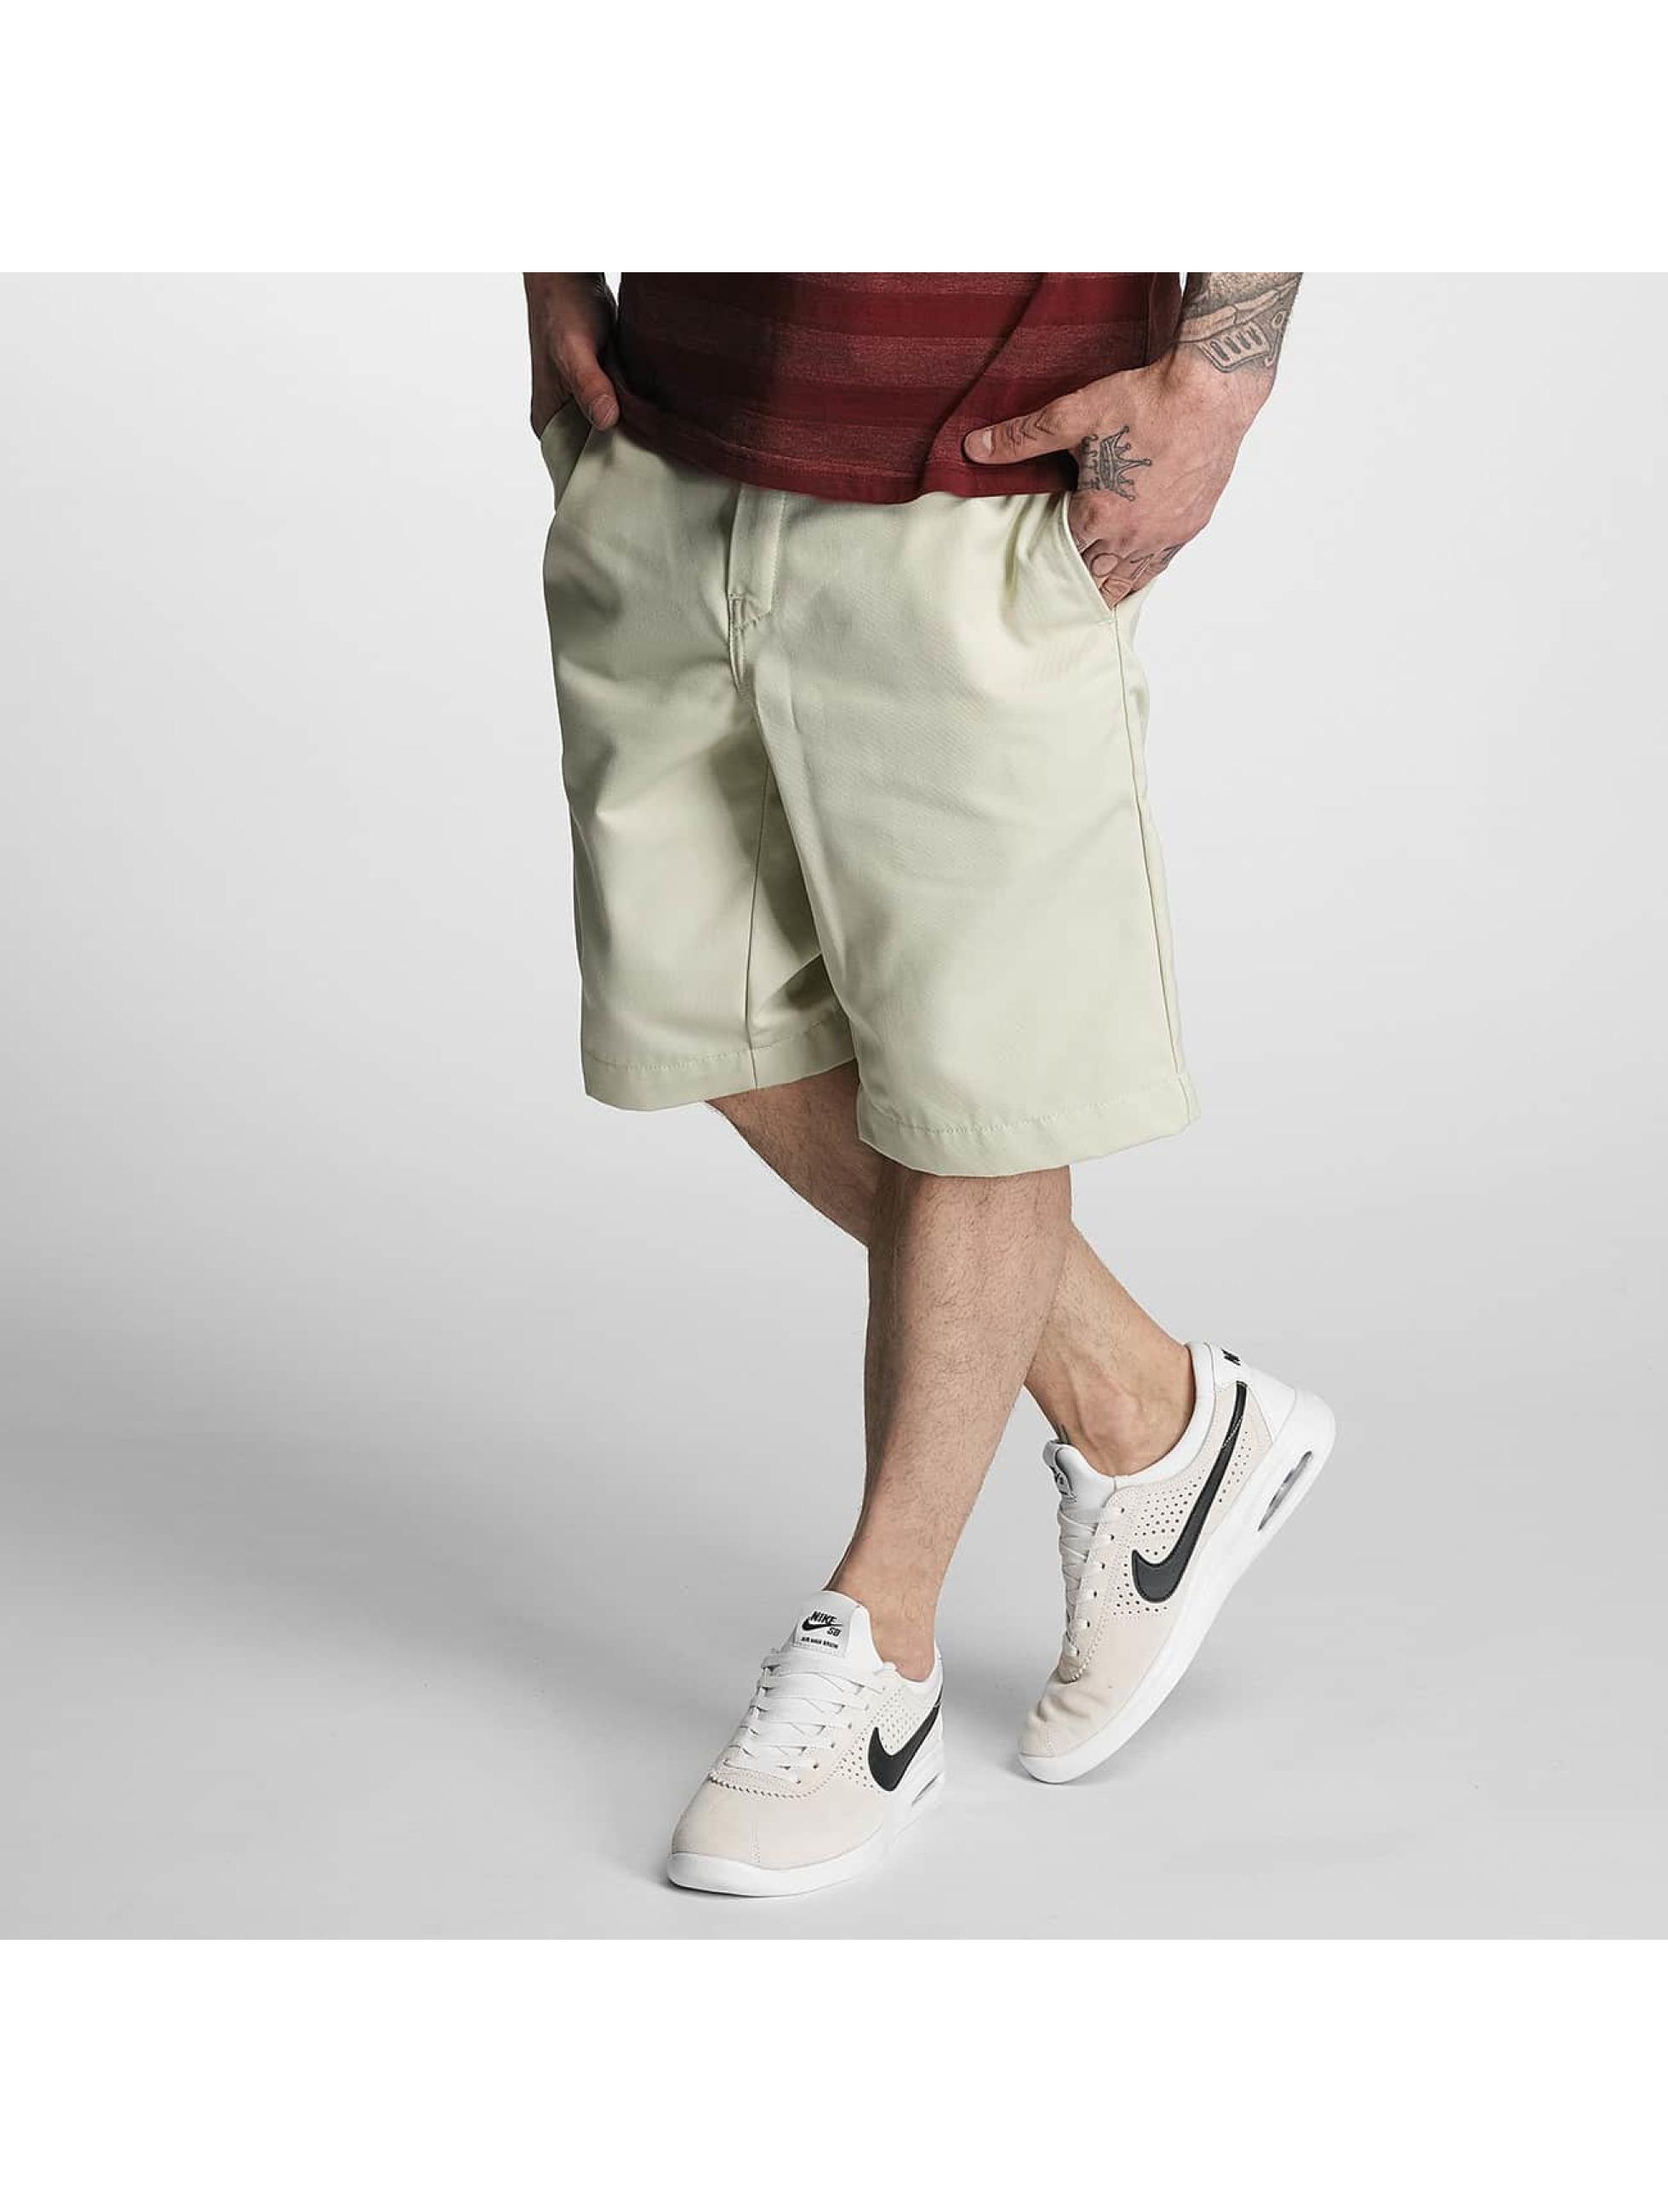 Carhartt WIP Männer Shorts Master in beige